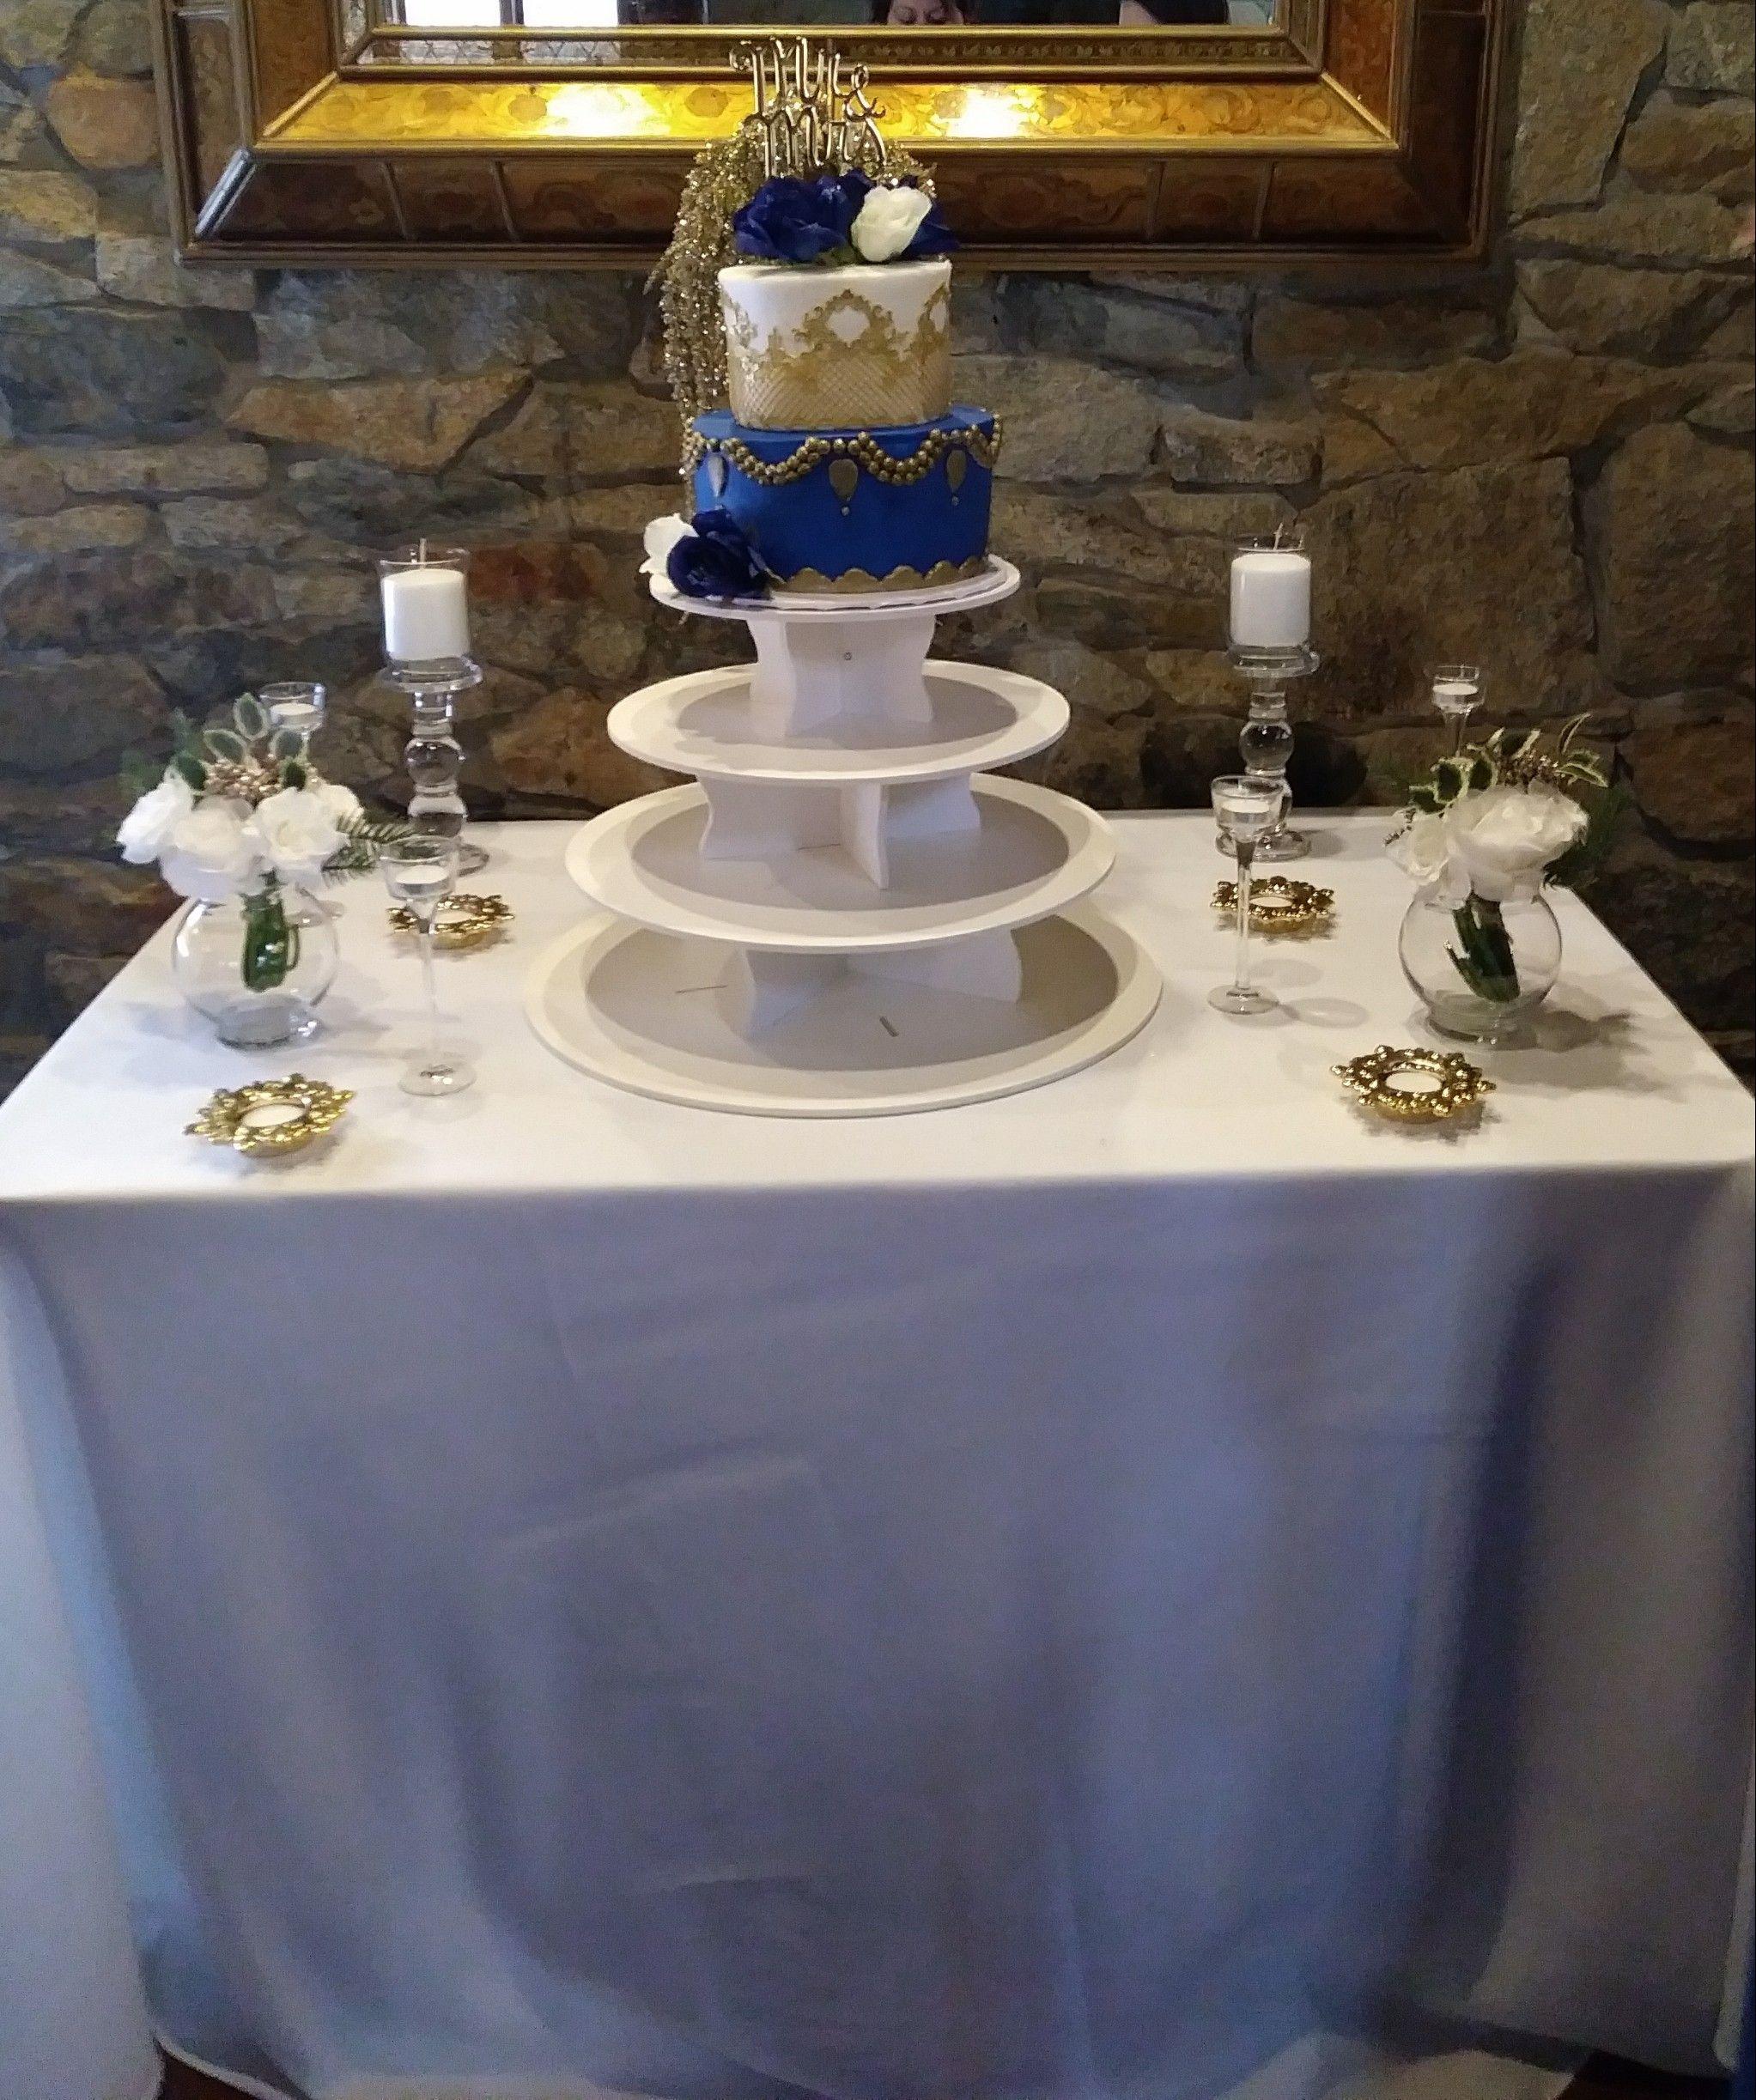 Royal Blue Gold White Wedding Cake Wedding Anniversary Cakes Anniversary Cake White Wedding Cake